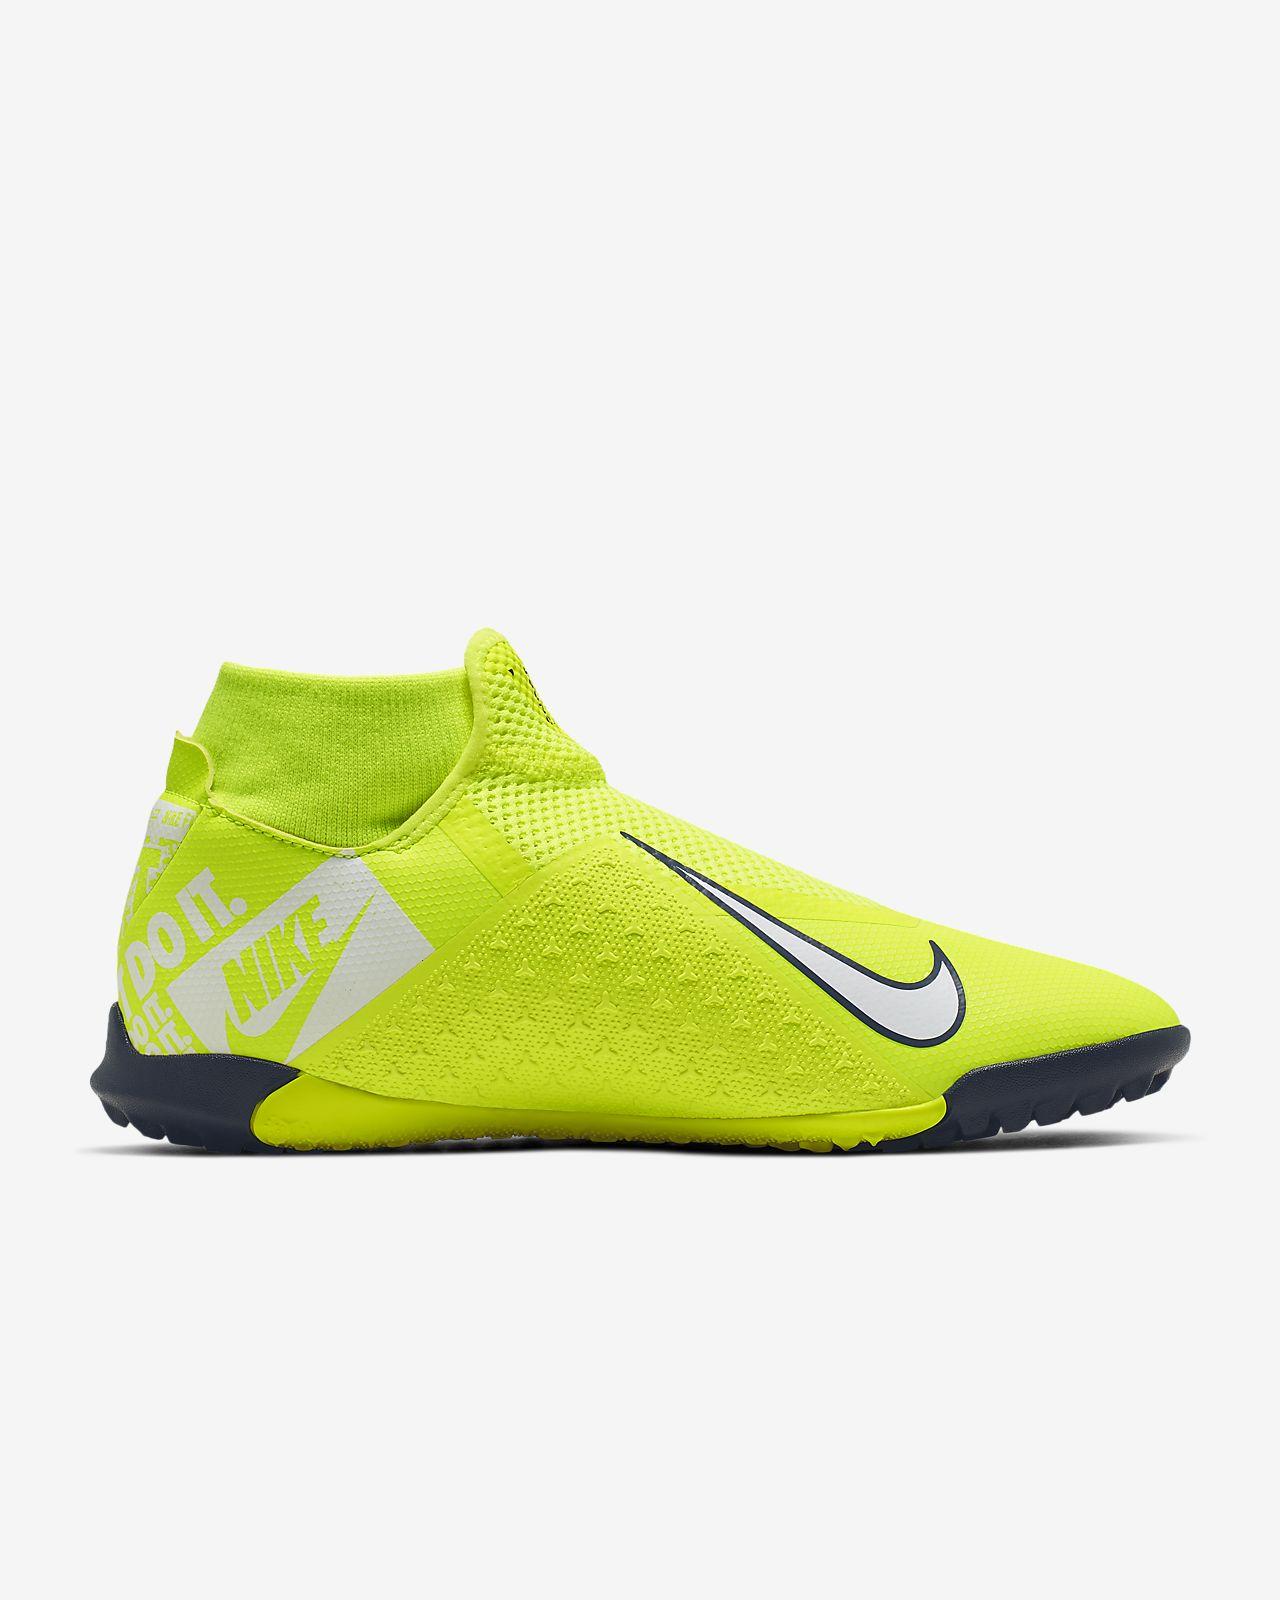 Nike Phantom Vision Academy Dynamic Fit TF Artificial Turf Football Boot